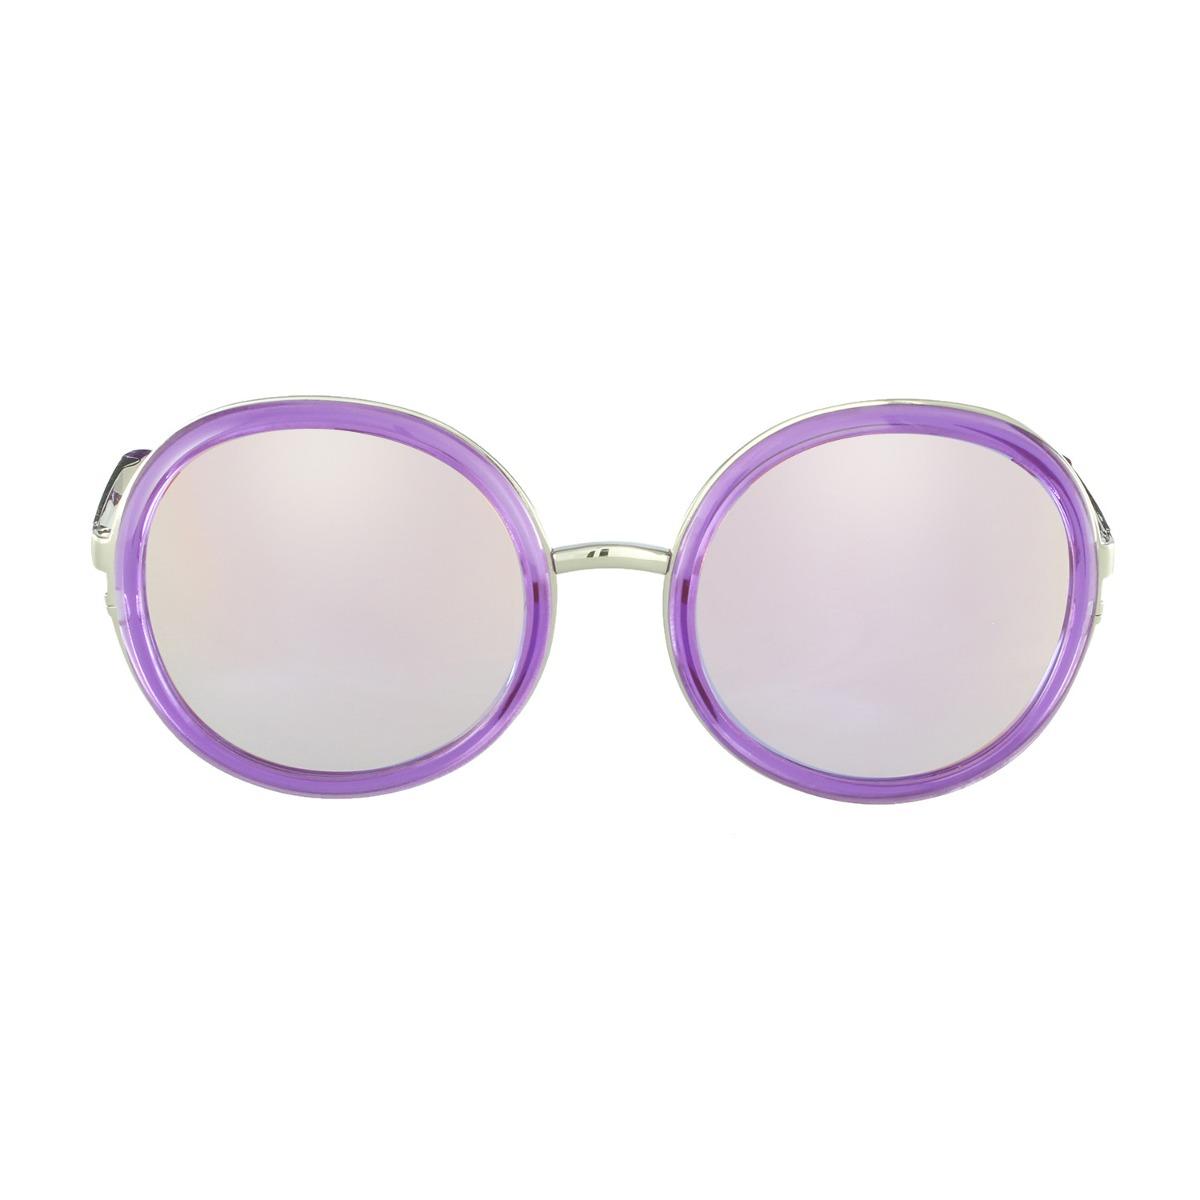 0c31ea39a7f43 Óculos De Sol Diesel Fashion Roxo - R  279,00 em Mercado Livre